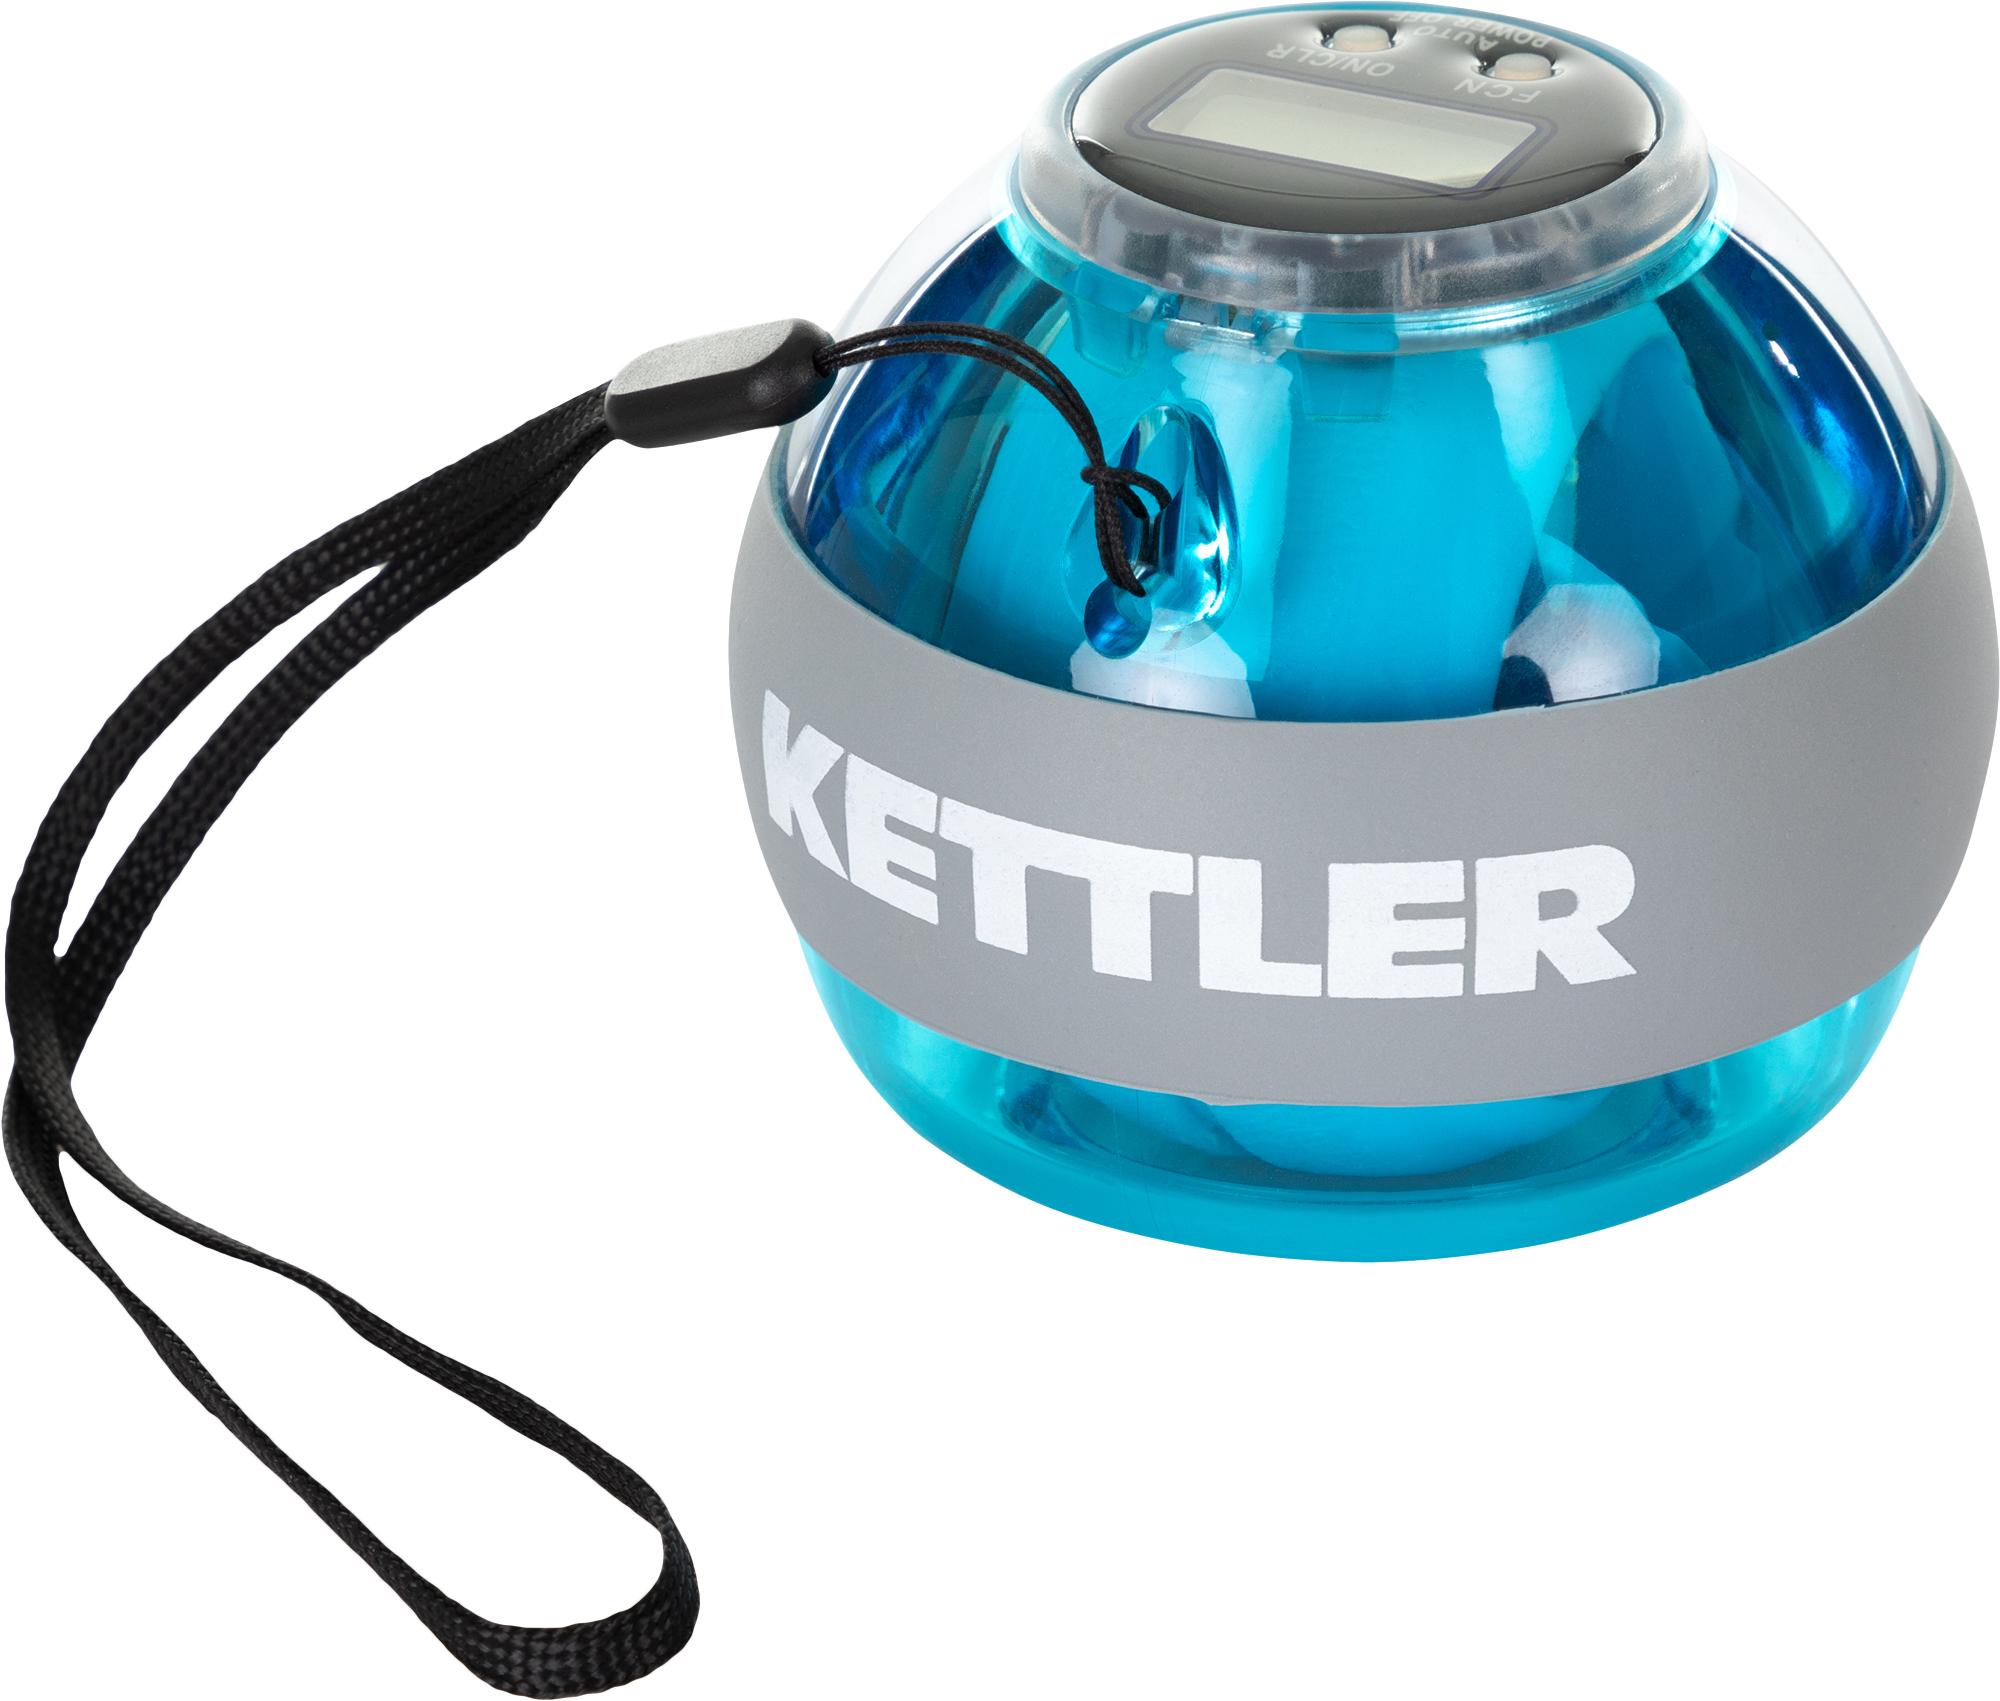 Kettler Тренажер гироскопический Kettler